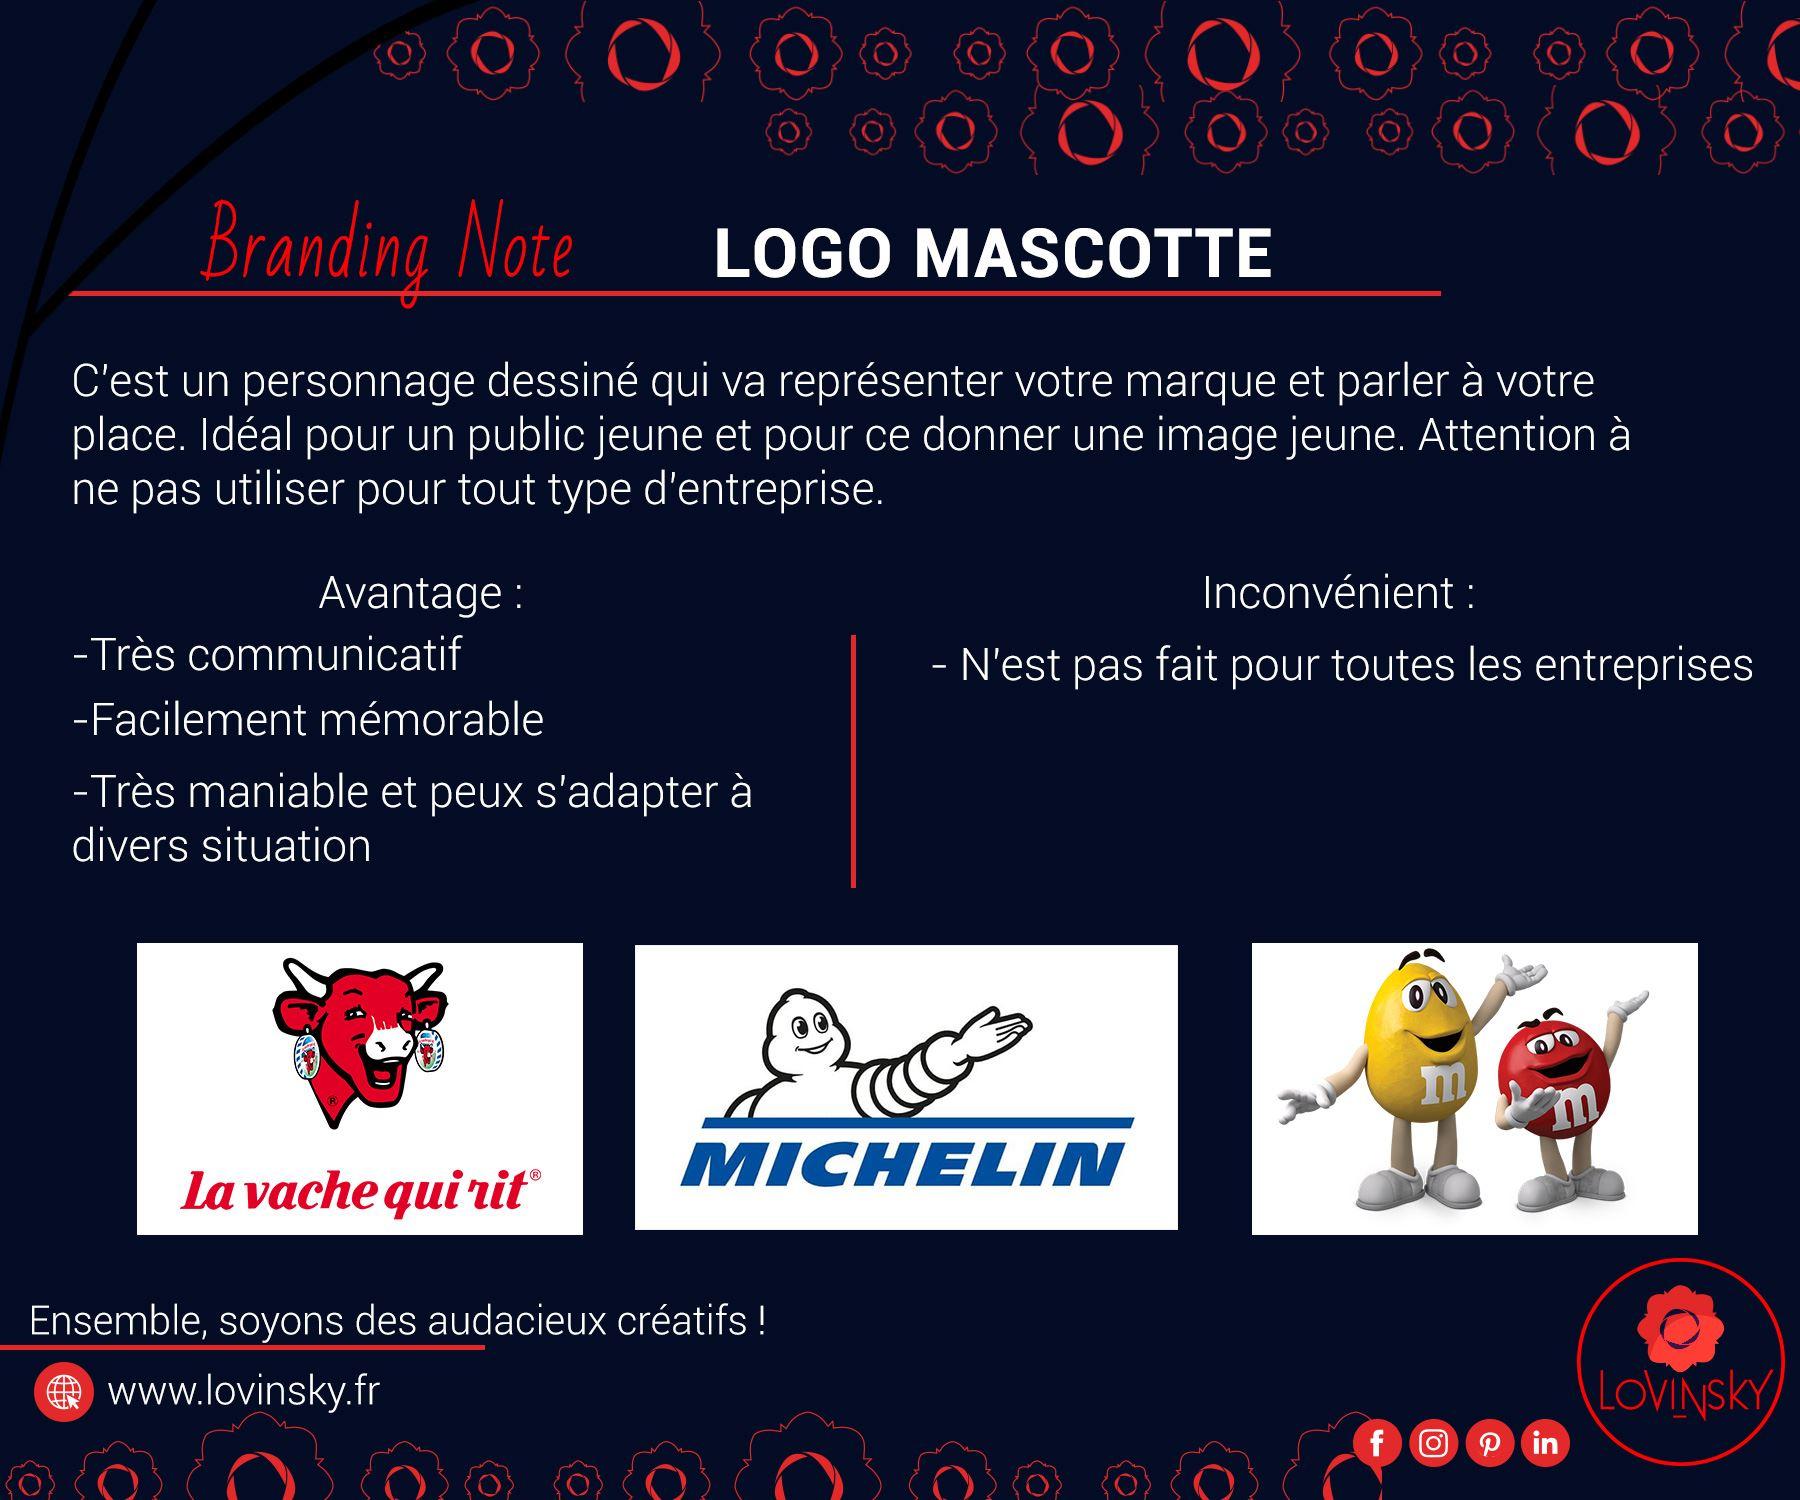 logo-mascotte lovinsky graphiste webdesigner freelance indépendant nantes 44